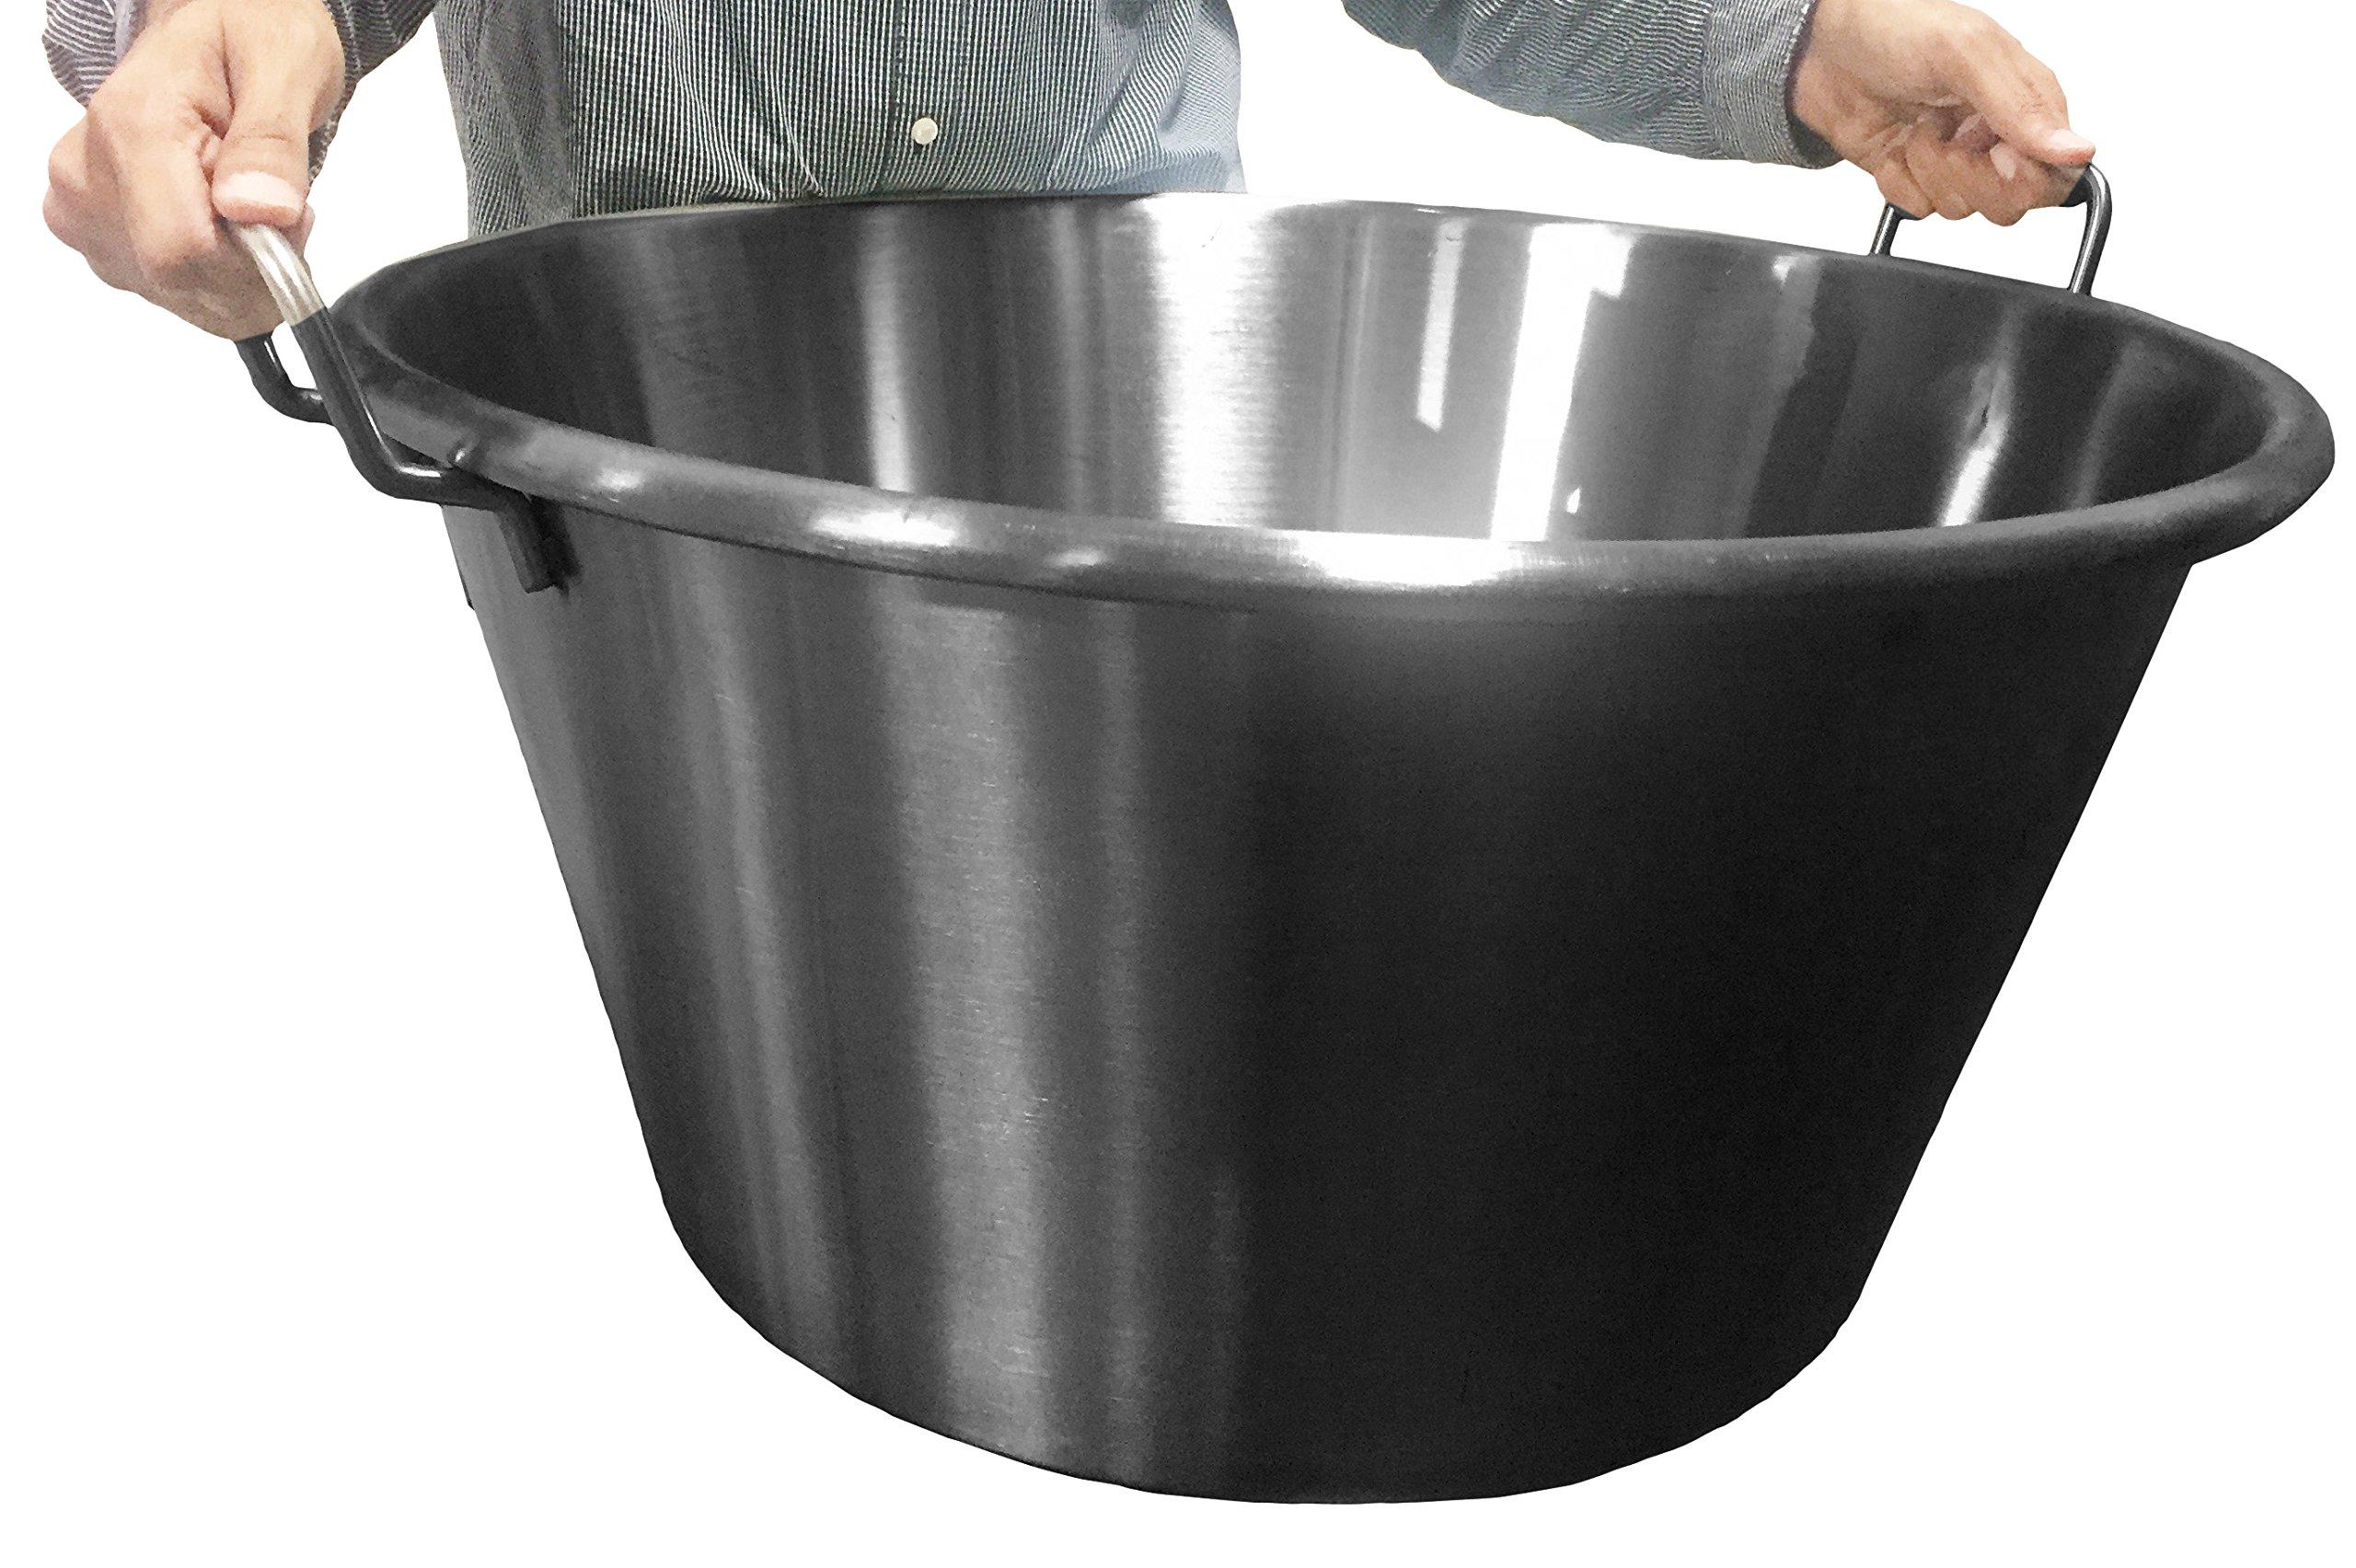 Bioexcel XXL Stainless Steel Wok - 16'', 20'' & 24'' - Cazos Para Carnitas - Heavy Duty Stainless Steel Cooking Wok - This One is (Diameter 24'' / Depth 14'')